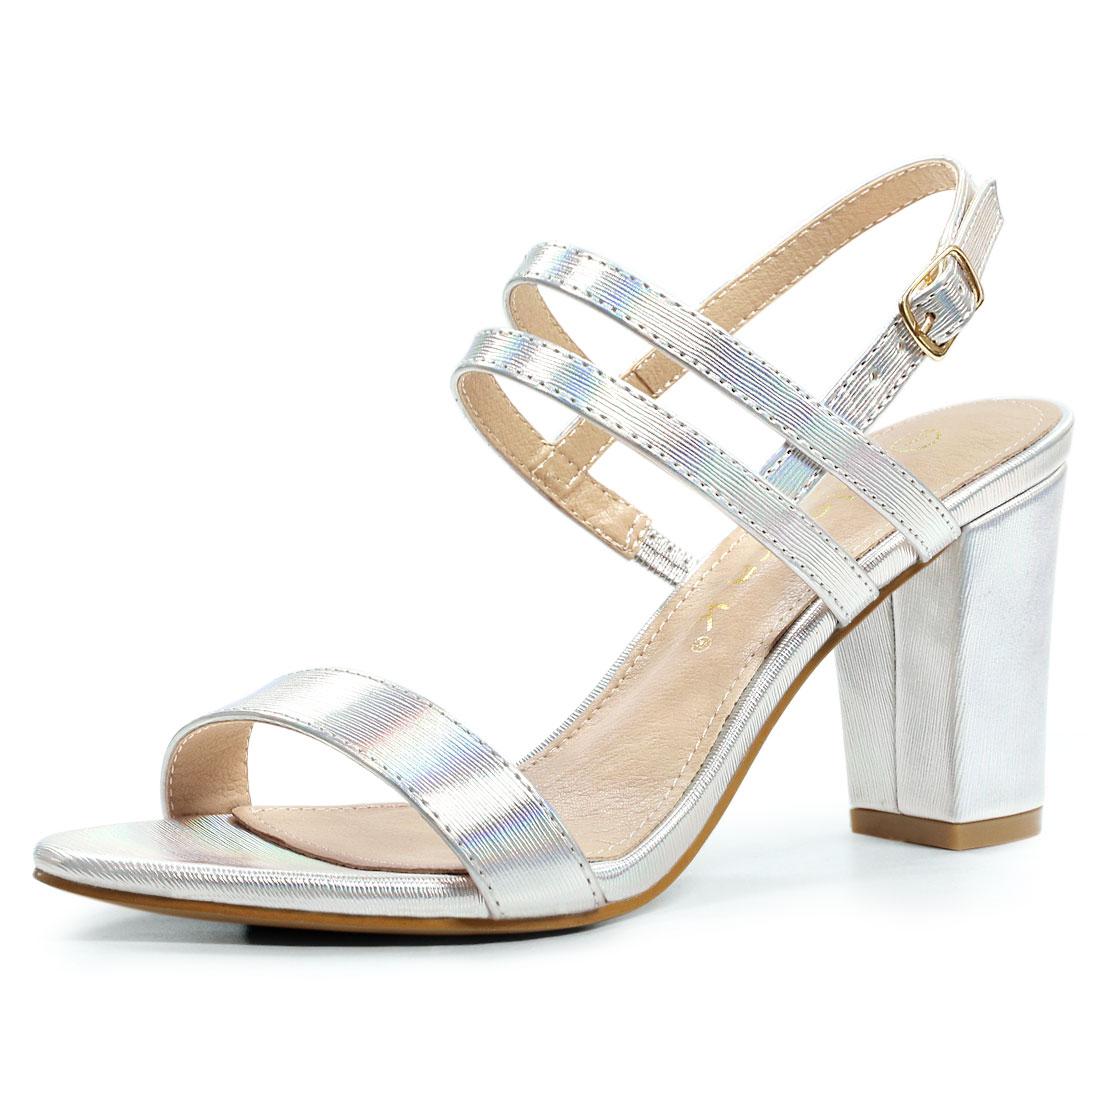 Allegra K Women's Slingback Block Heel Ankle Strap Sandals Silver US 5.5